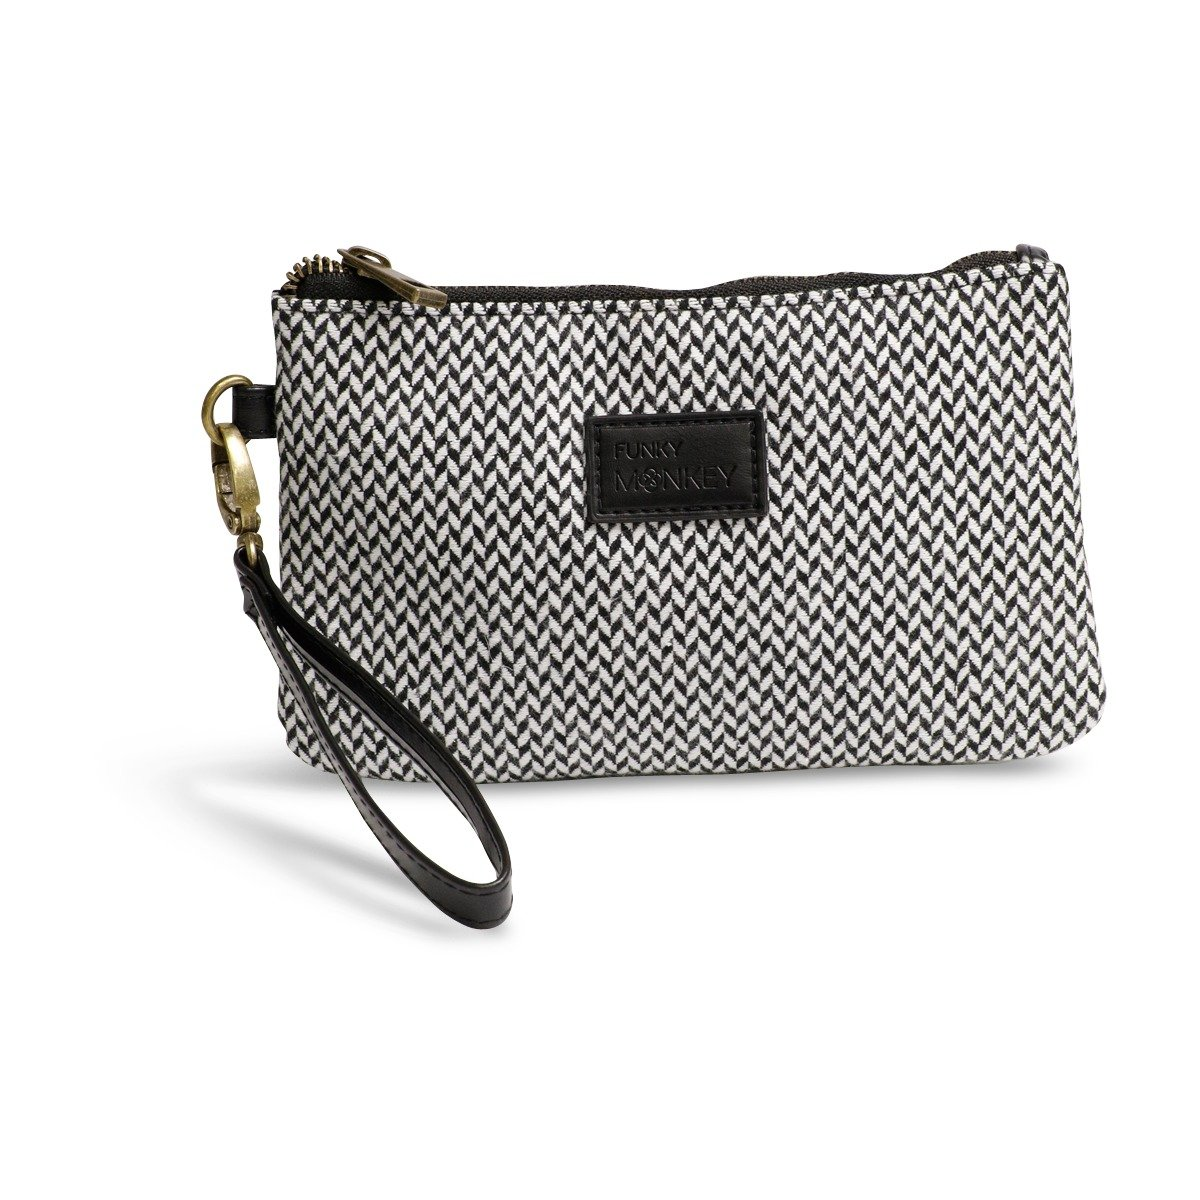 {Emily Collection} Wristlet Wallet Clutch Bag - Phone Purse Handbag - Small, Medium, Large Option - Black & White Herringbone Style - Funky Monkey Fashion (Medium)